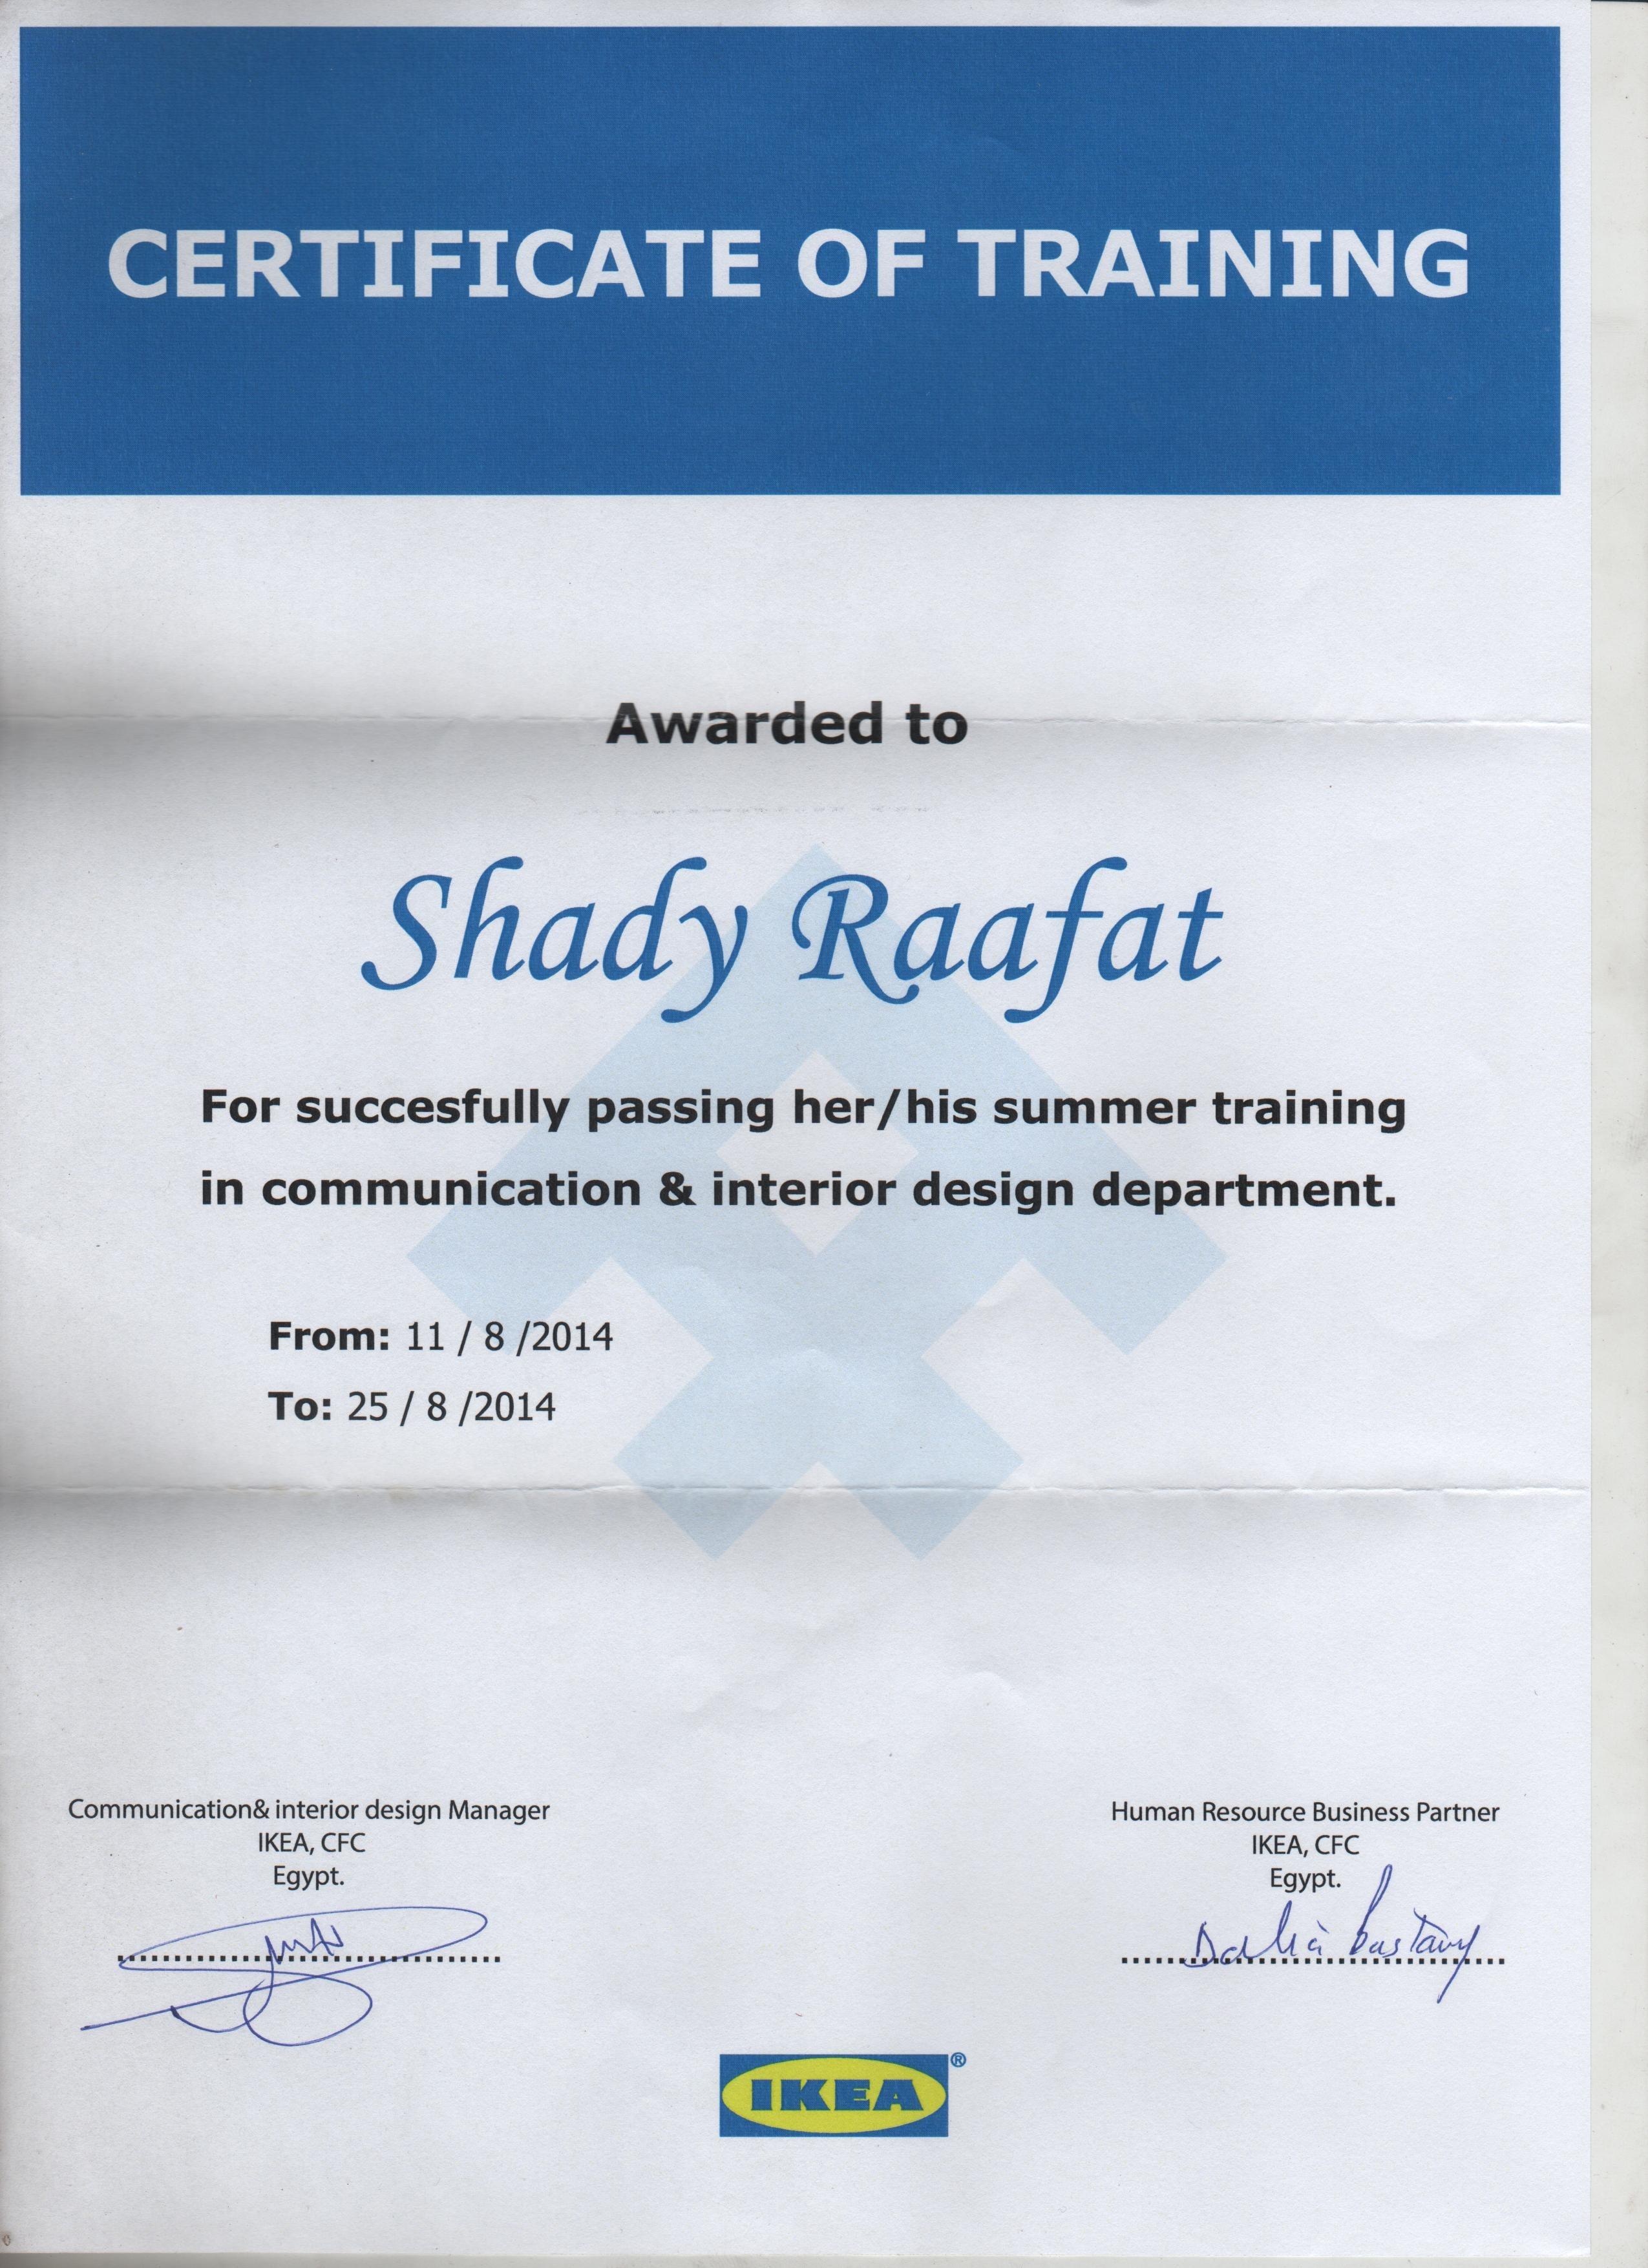 Training Institute IKEA Egypt